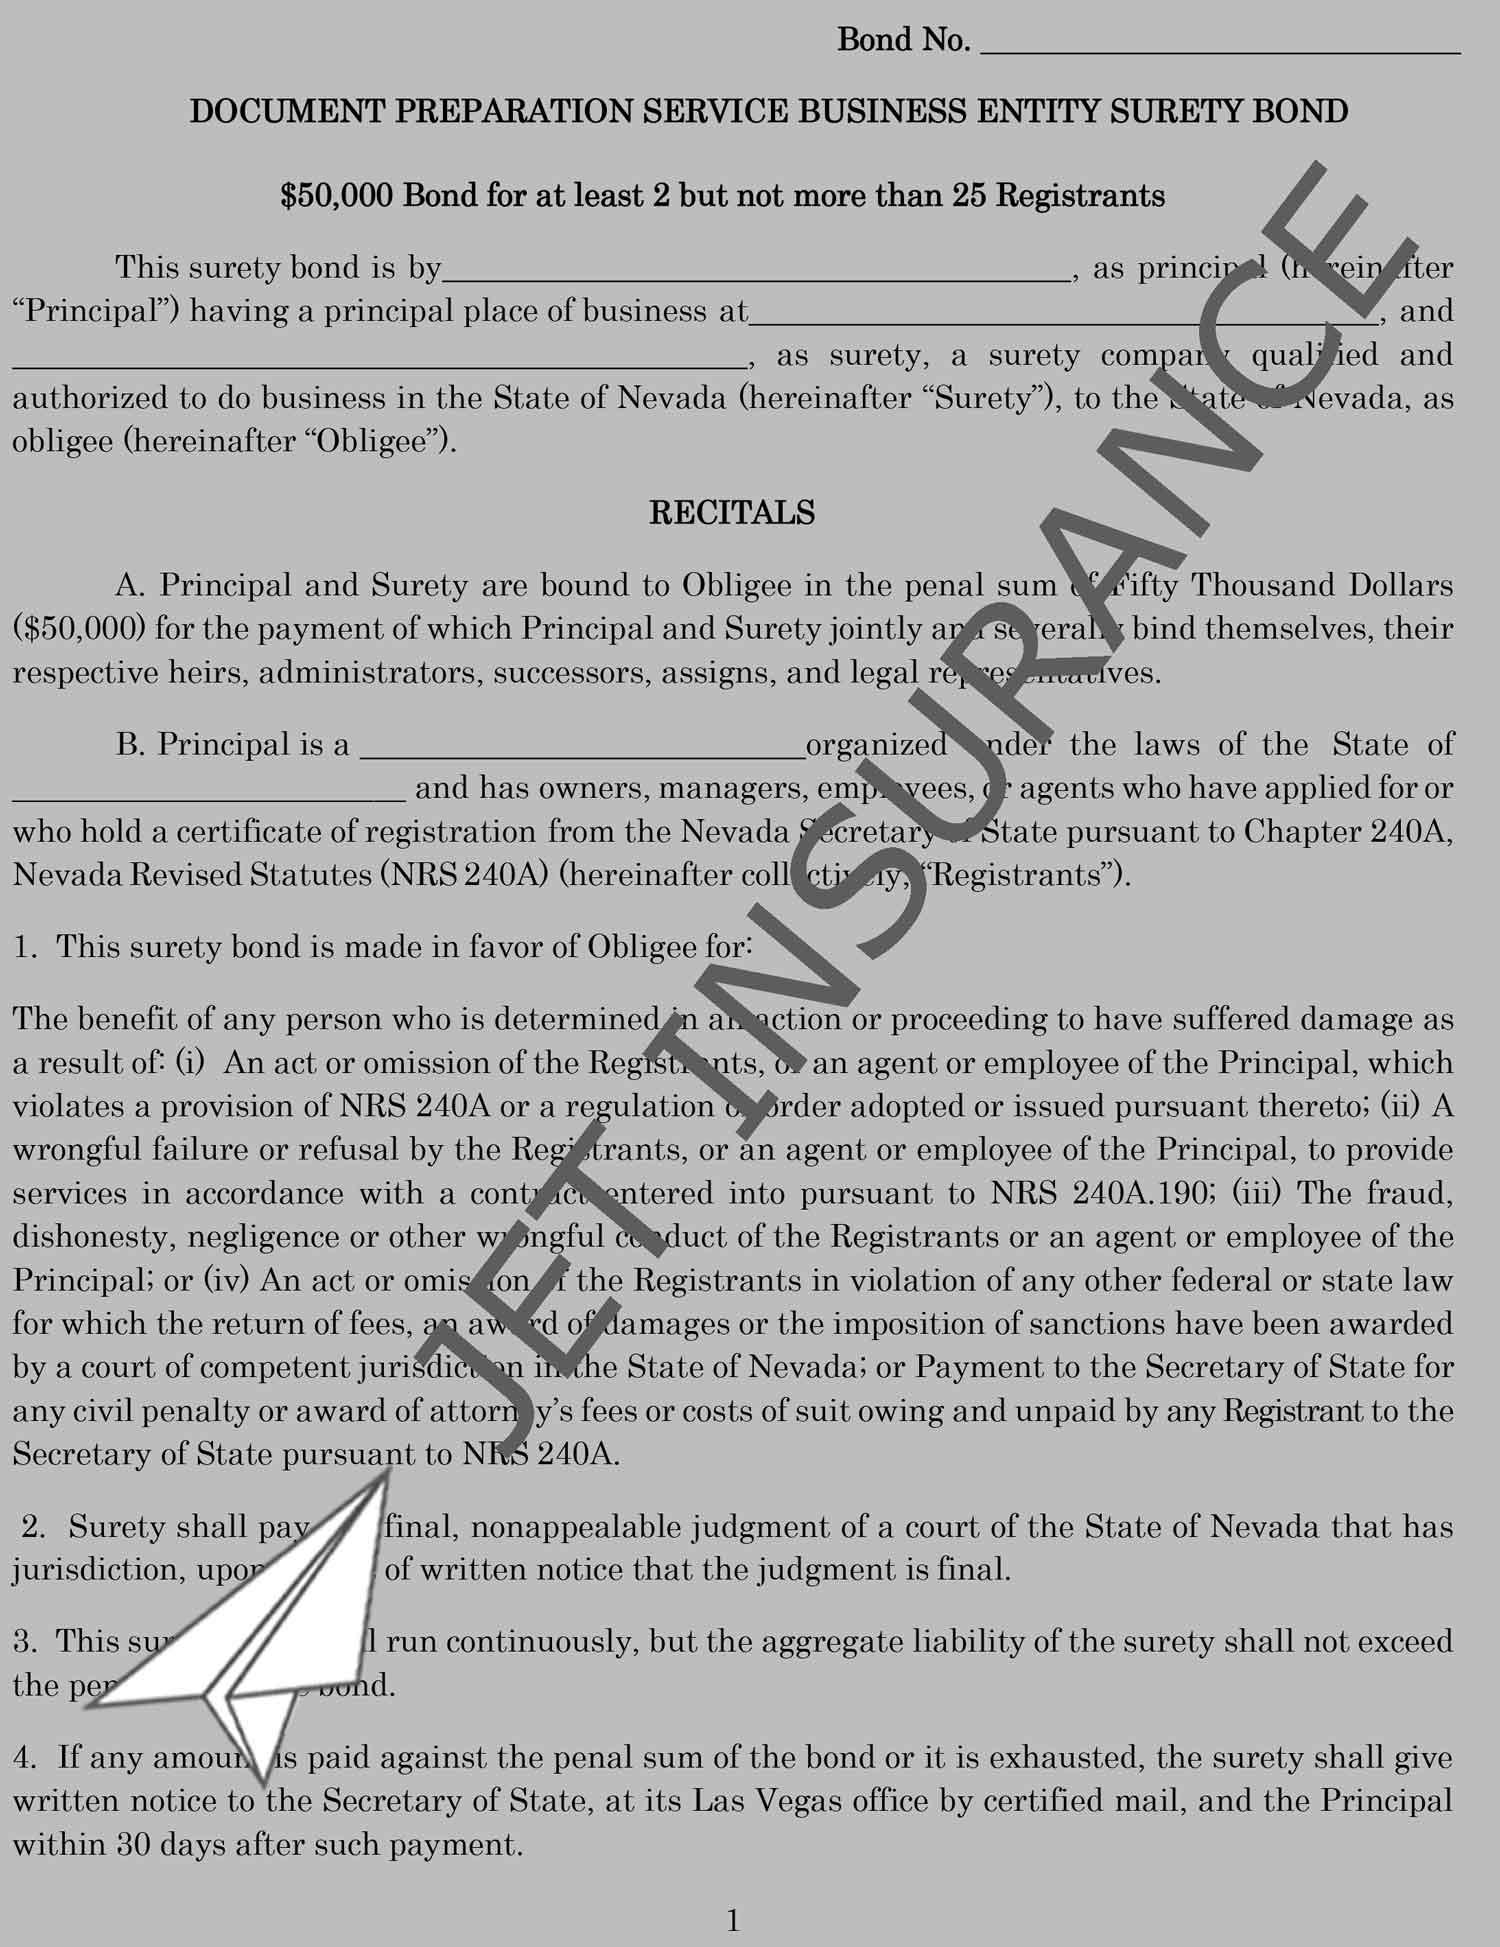 Nevada Document Preparation Service Bond Form